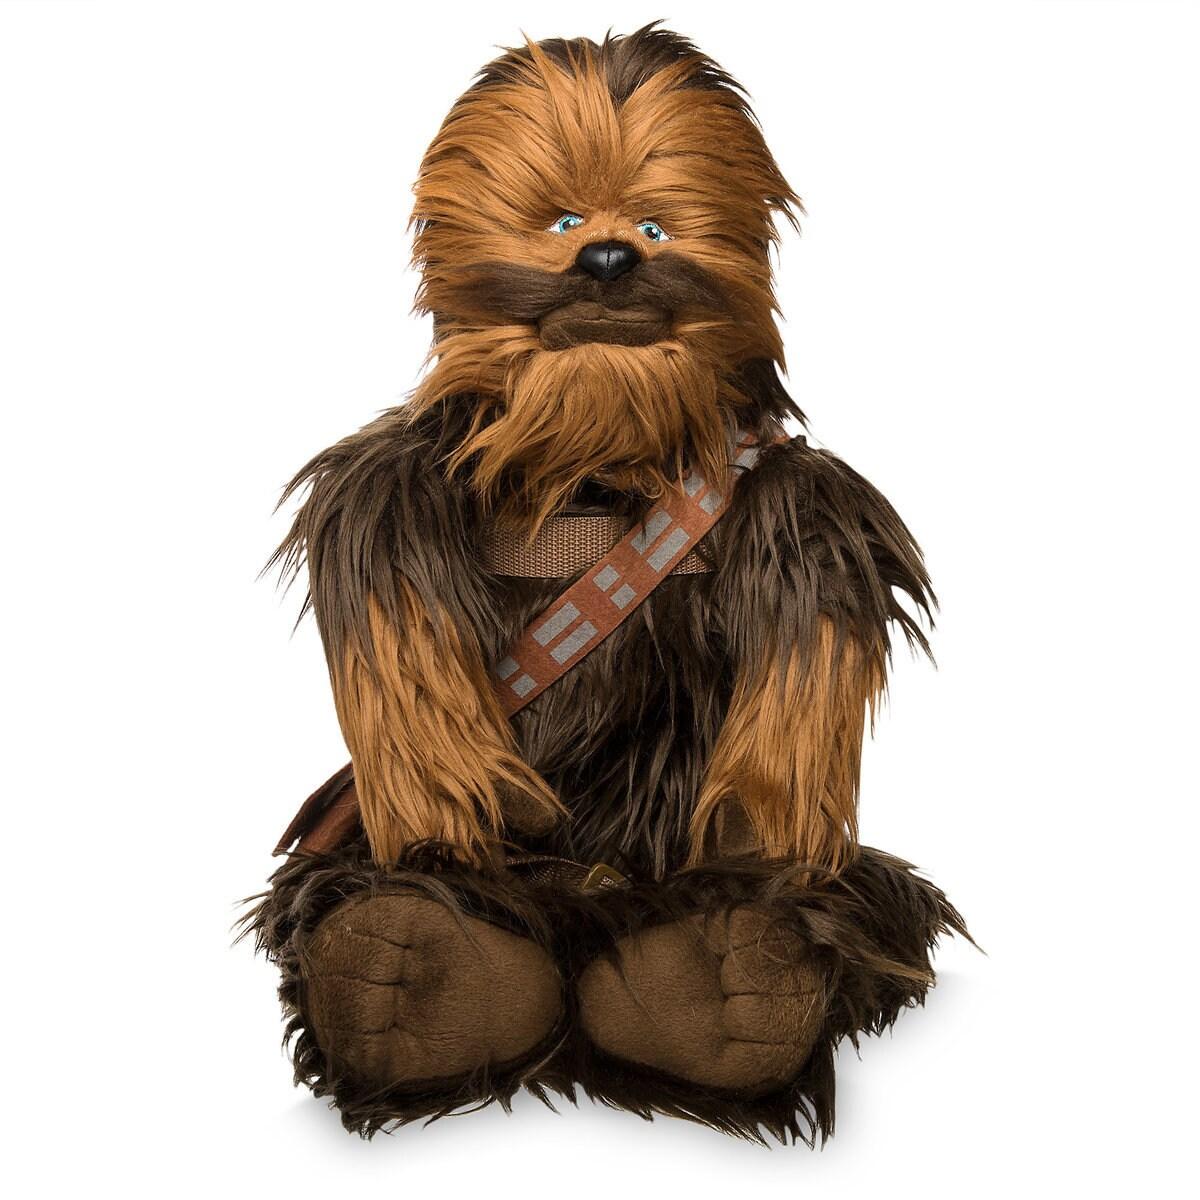 c32f9b14e14 Product Image of Chewbacca Plush Backpack - Star Wars   1